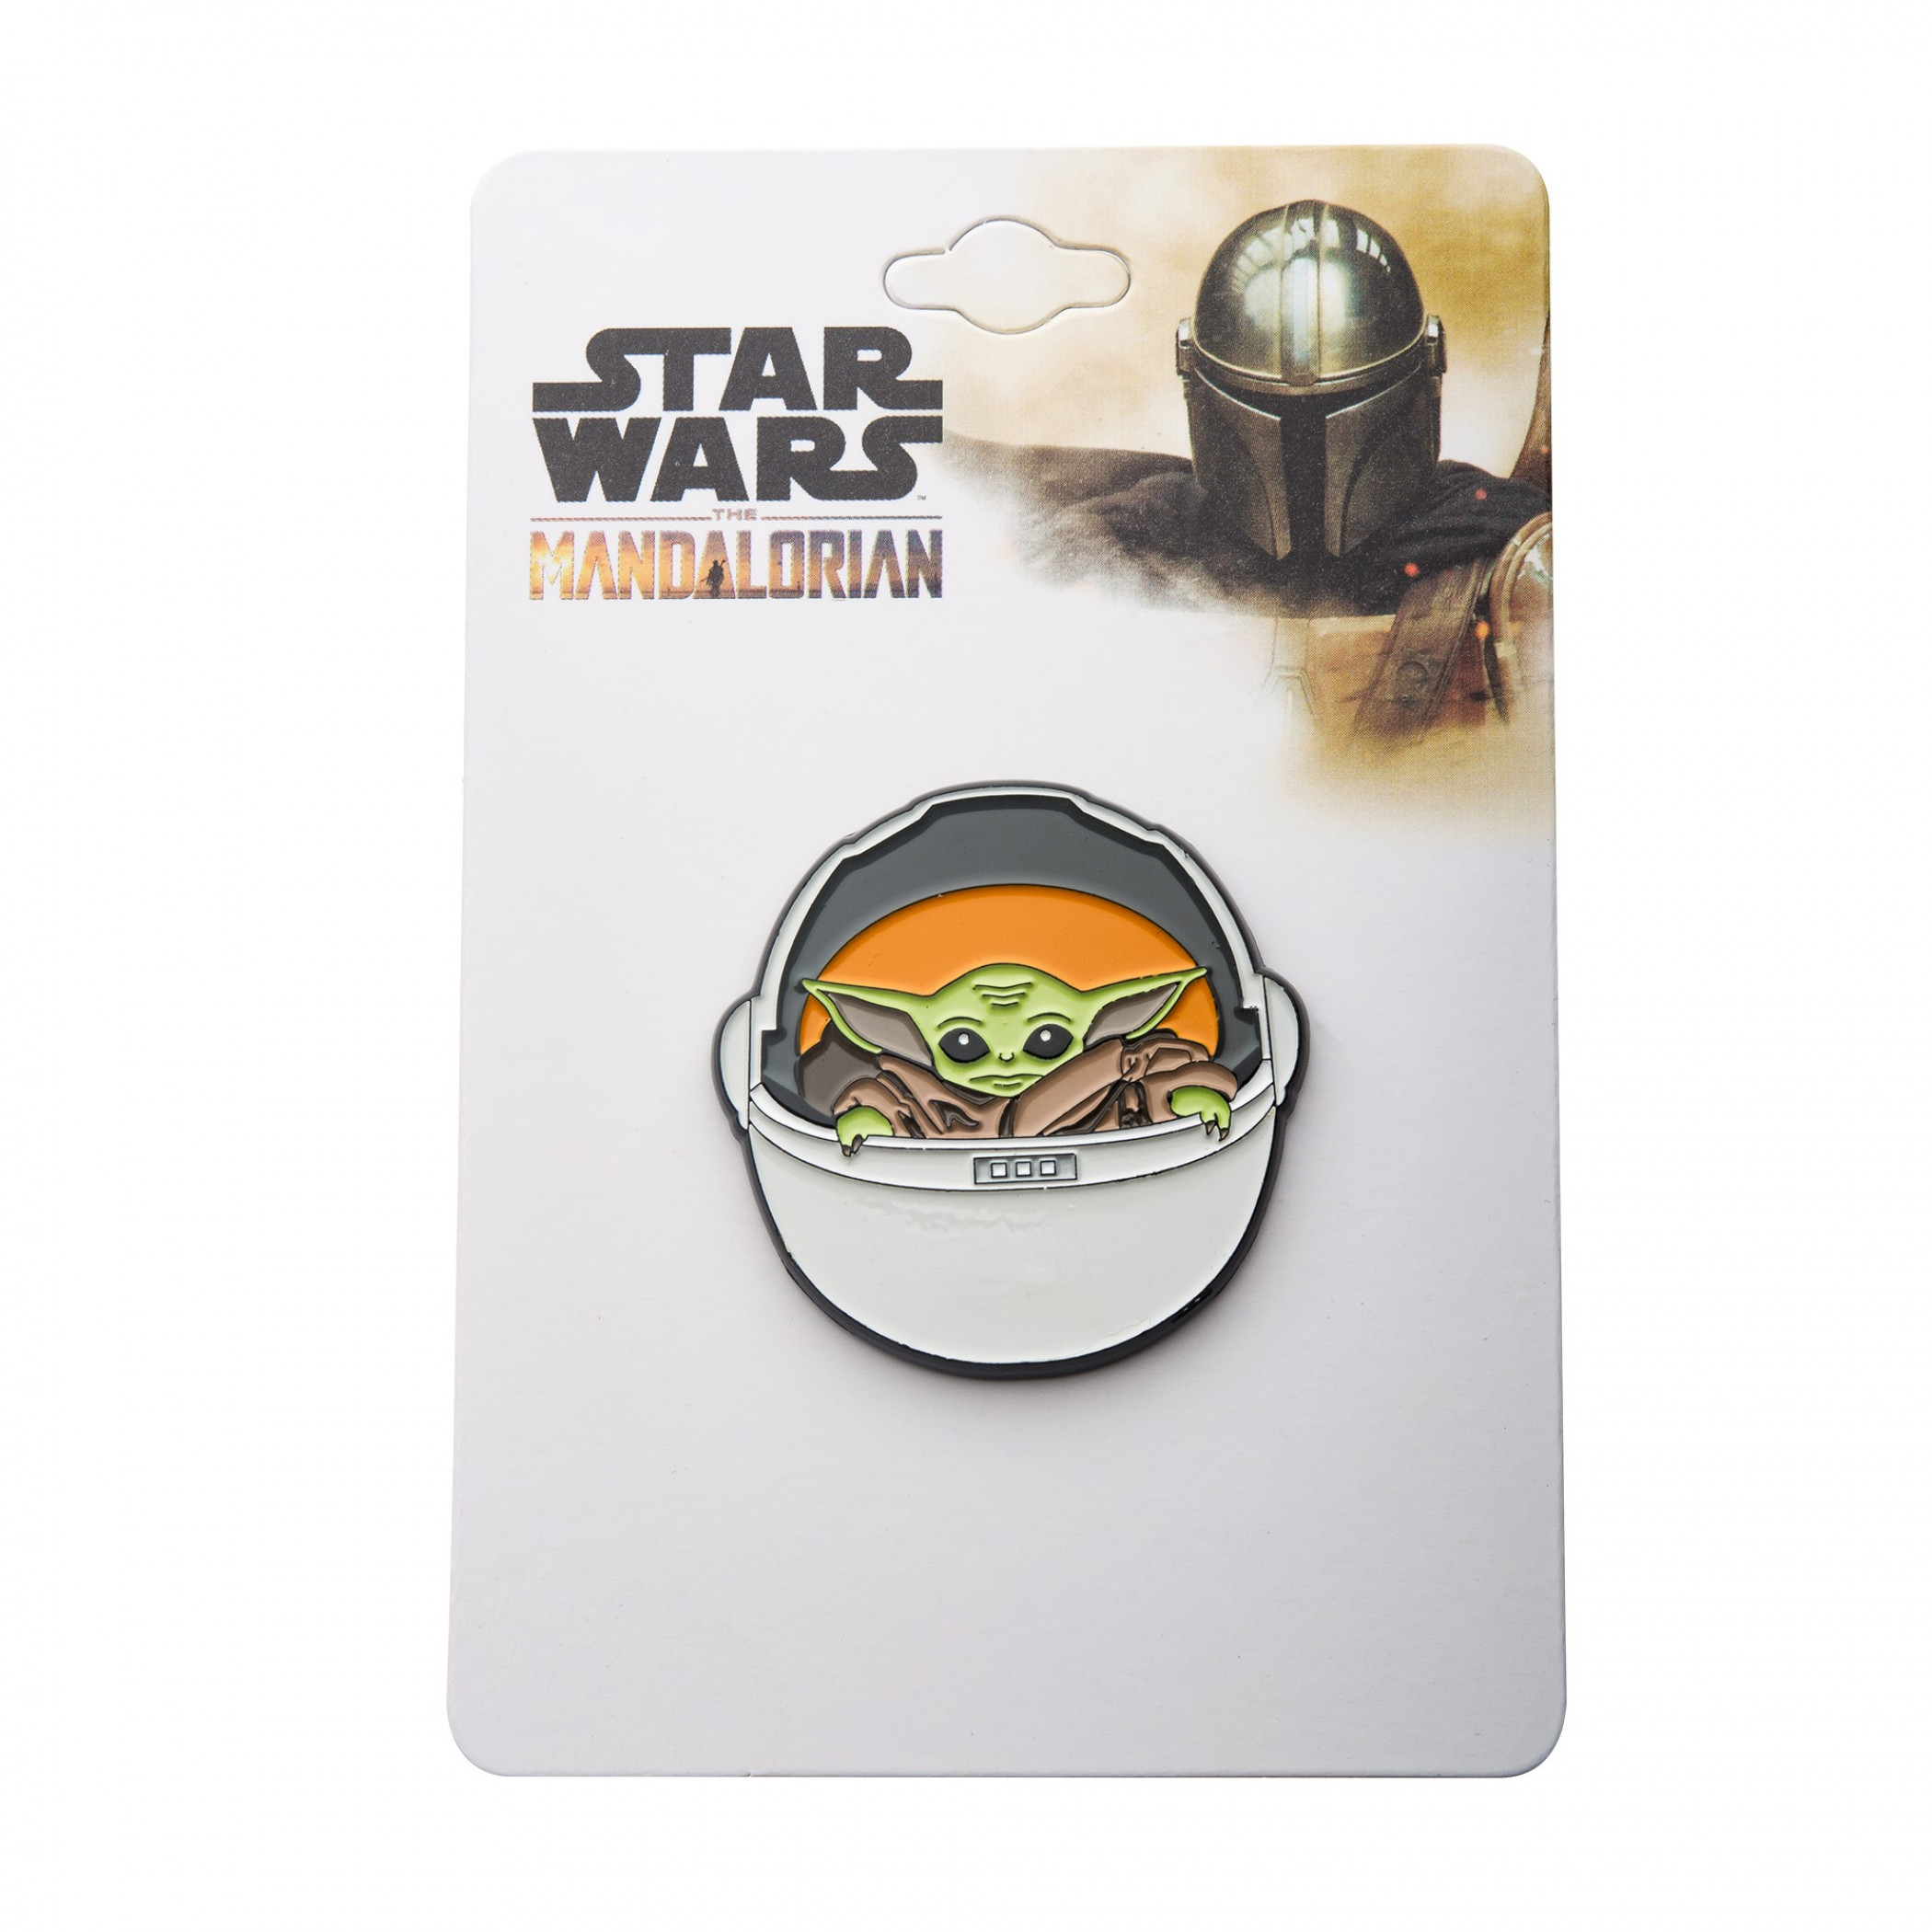 Star Wars The Mandalorian The Child Cradle Pod Lapel Pin